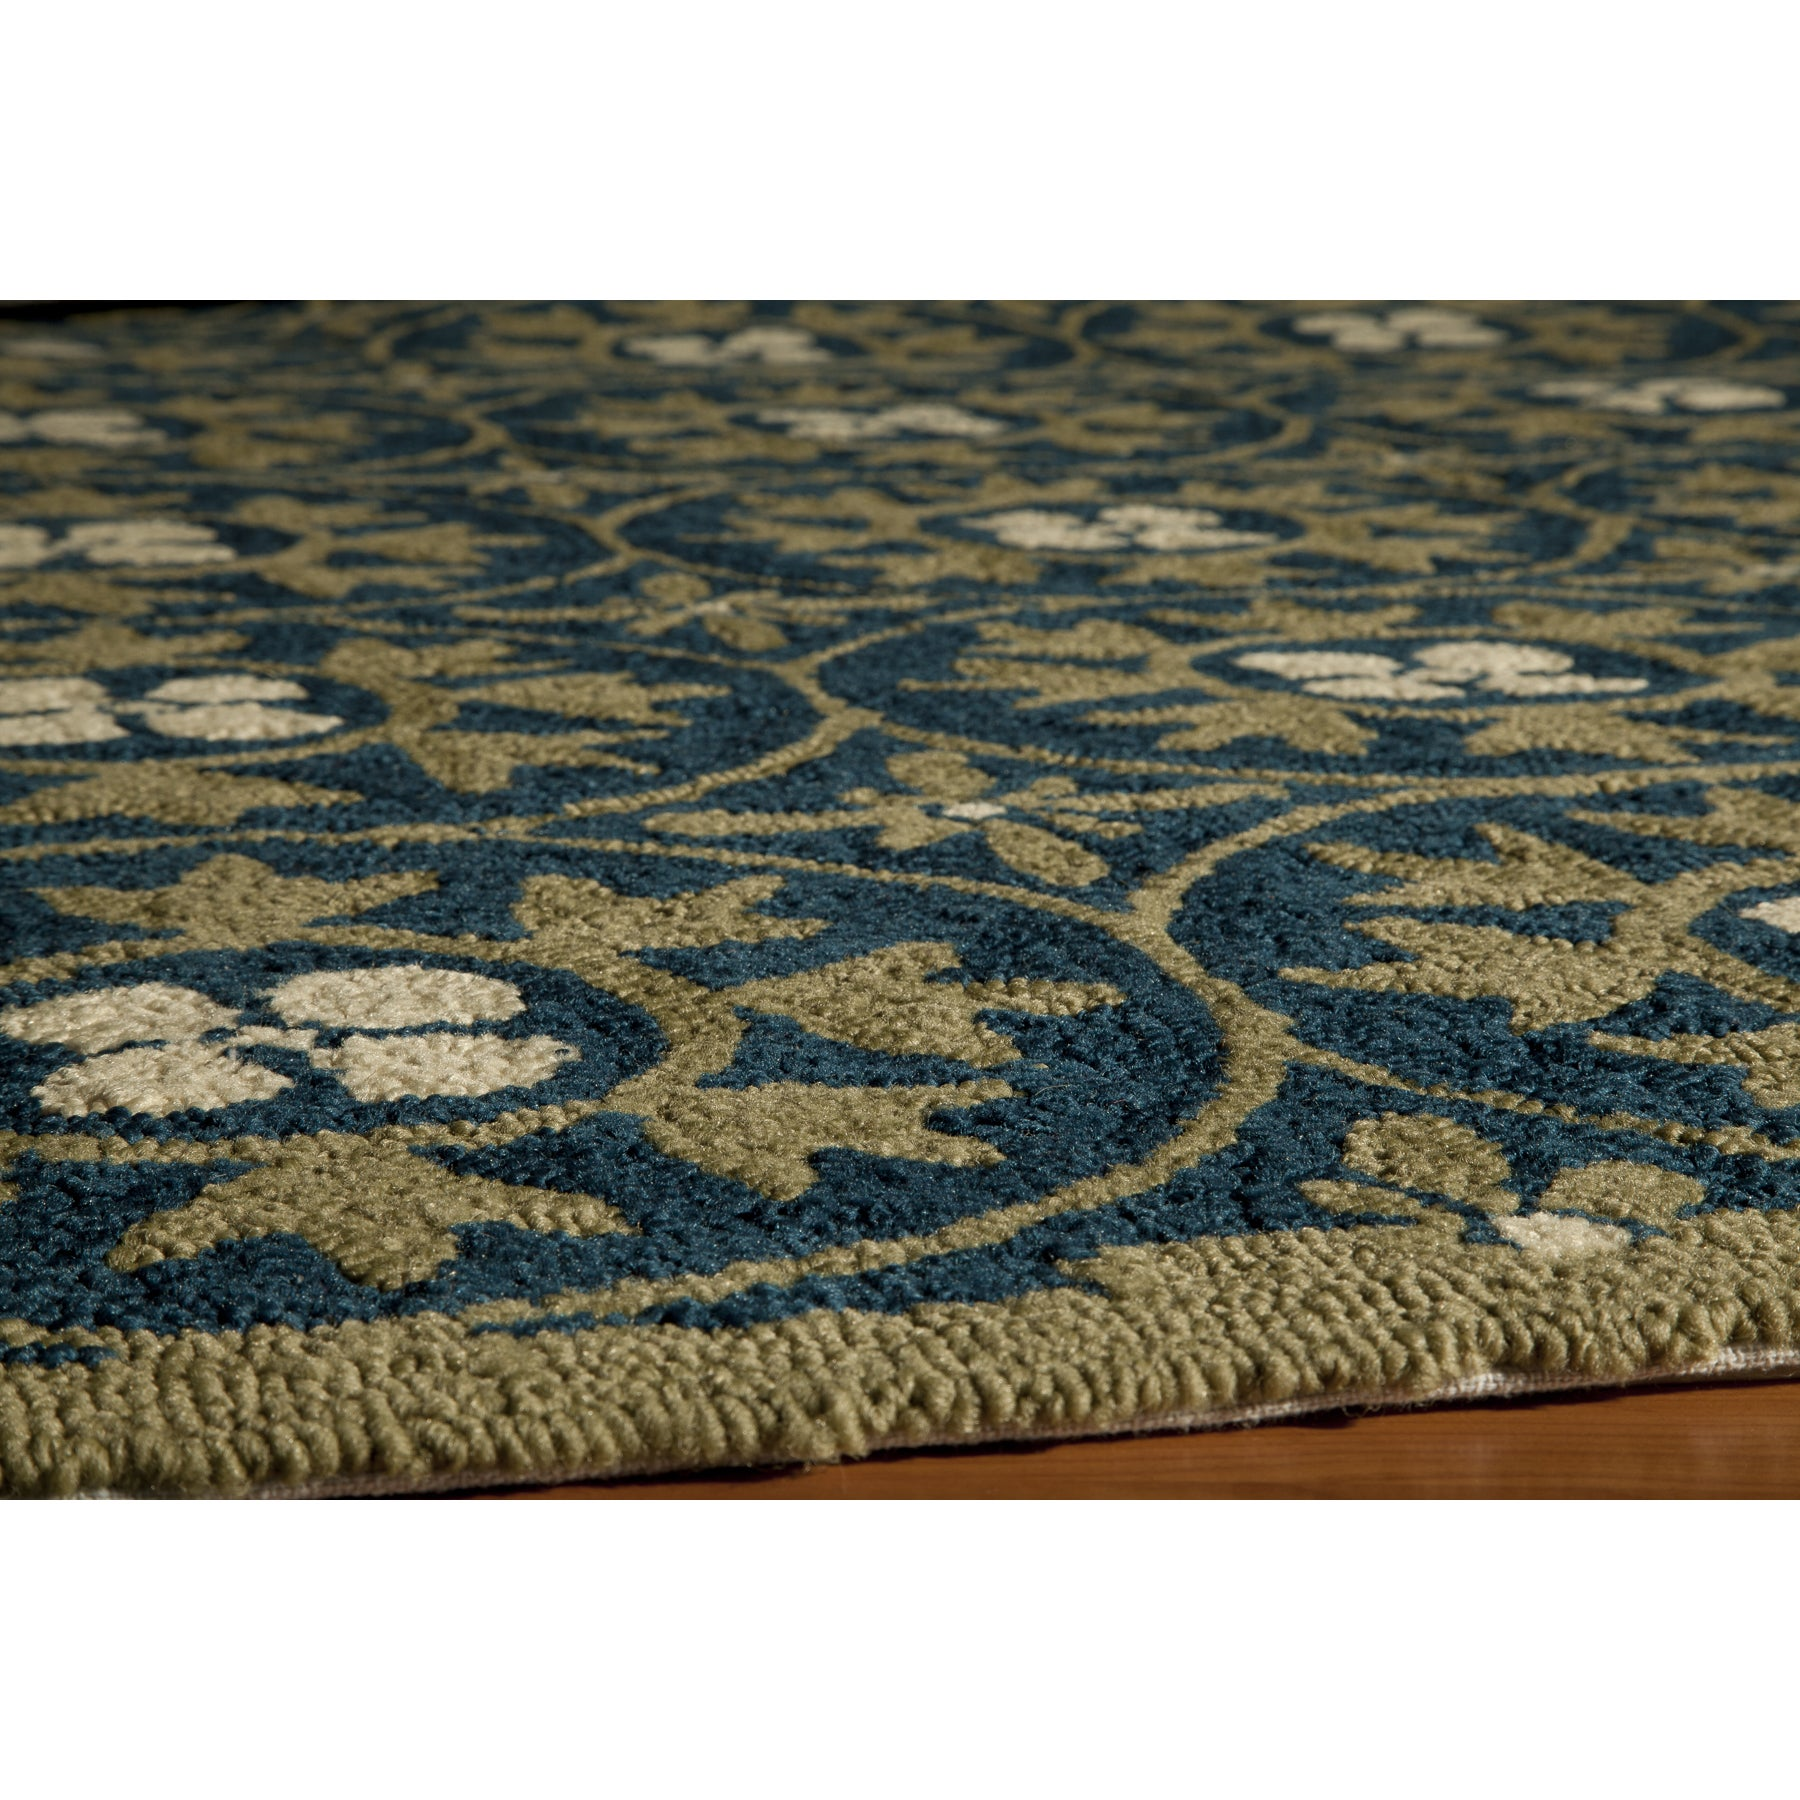 Momeni Veranda Blue Moroccan Tile Indoor/Outdoor Rug (2' X